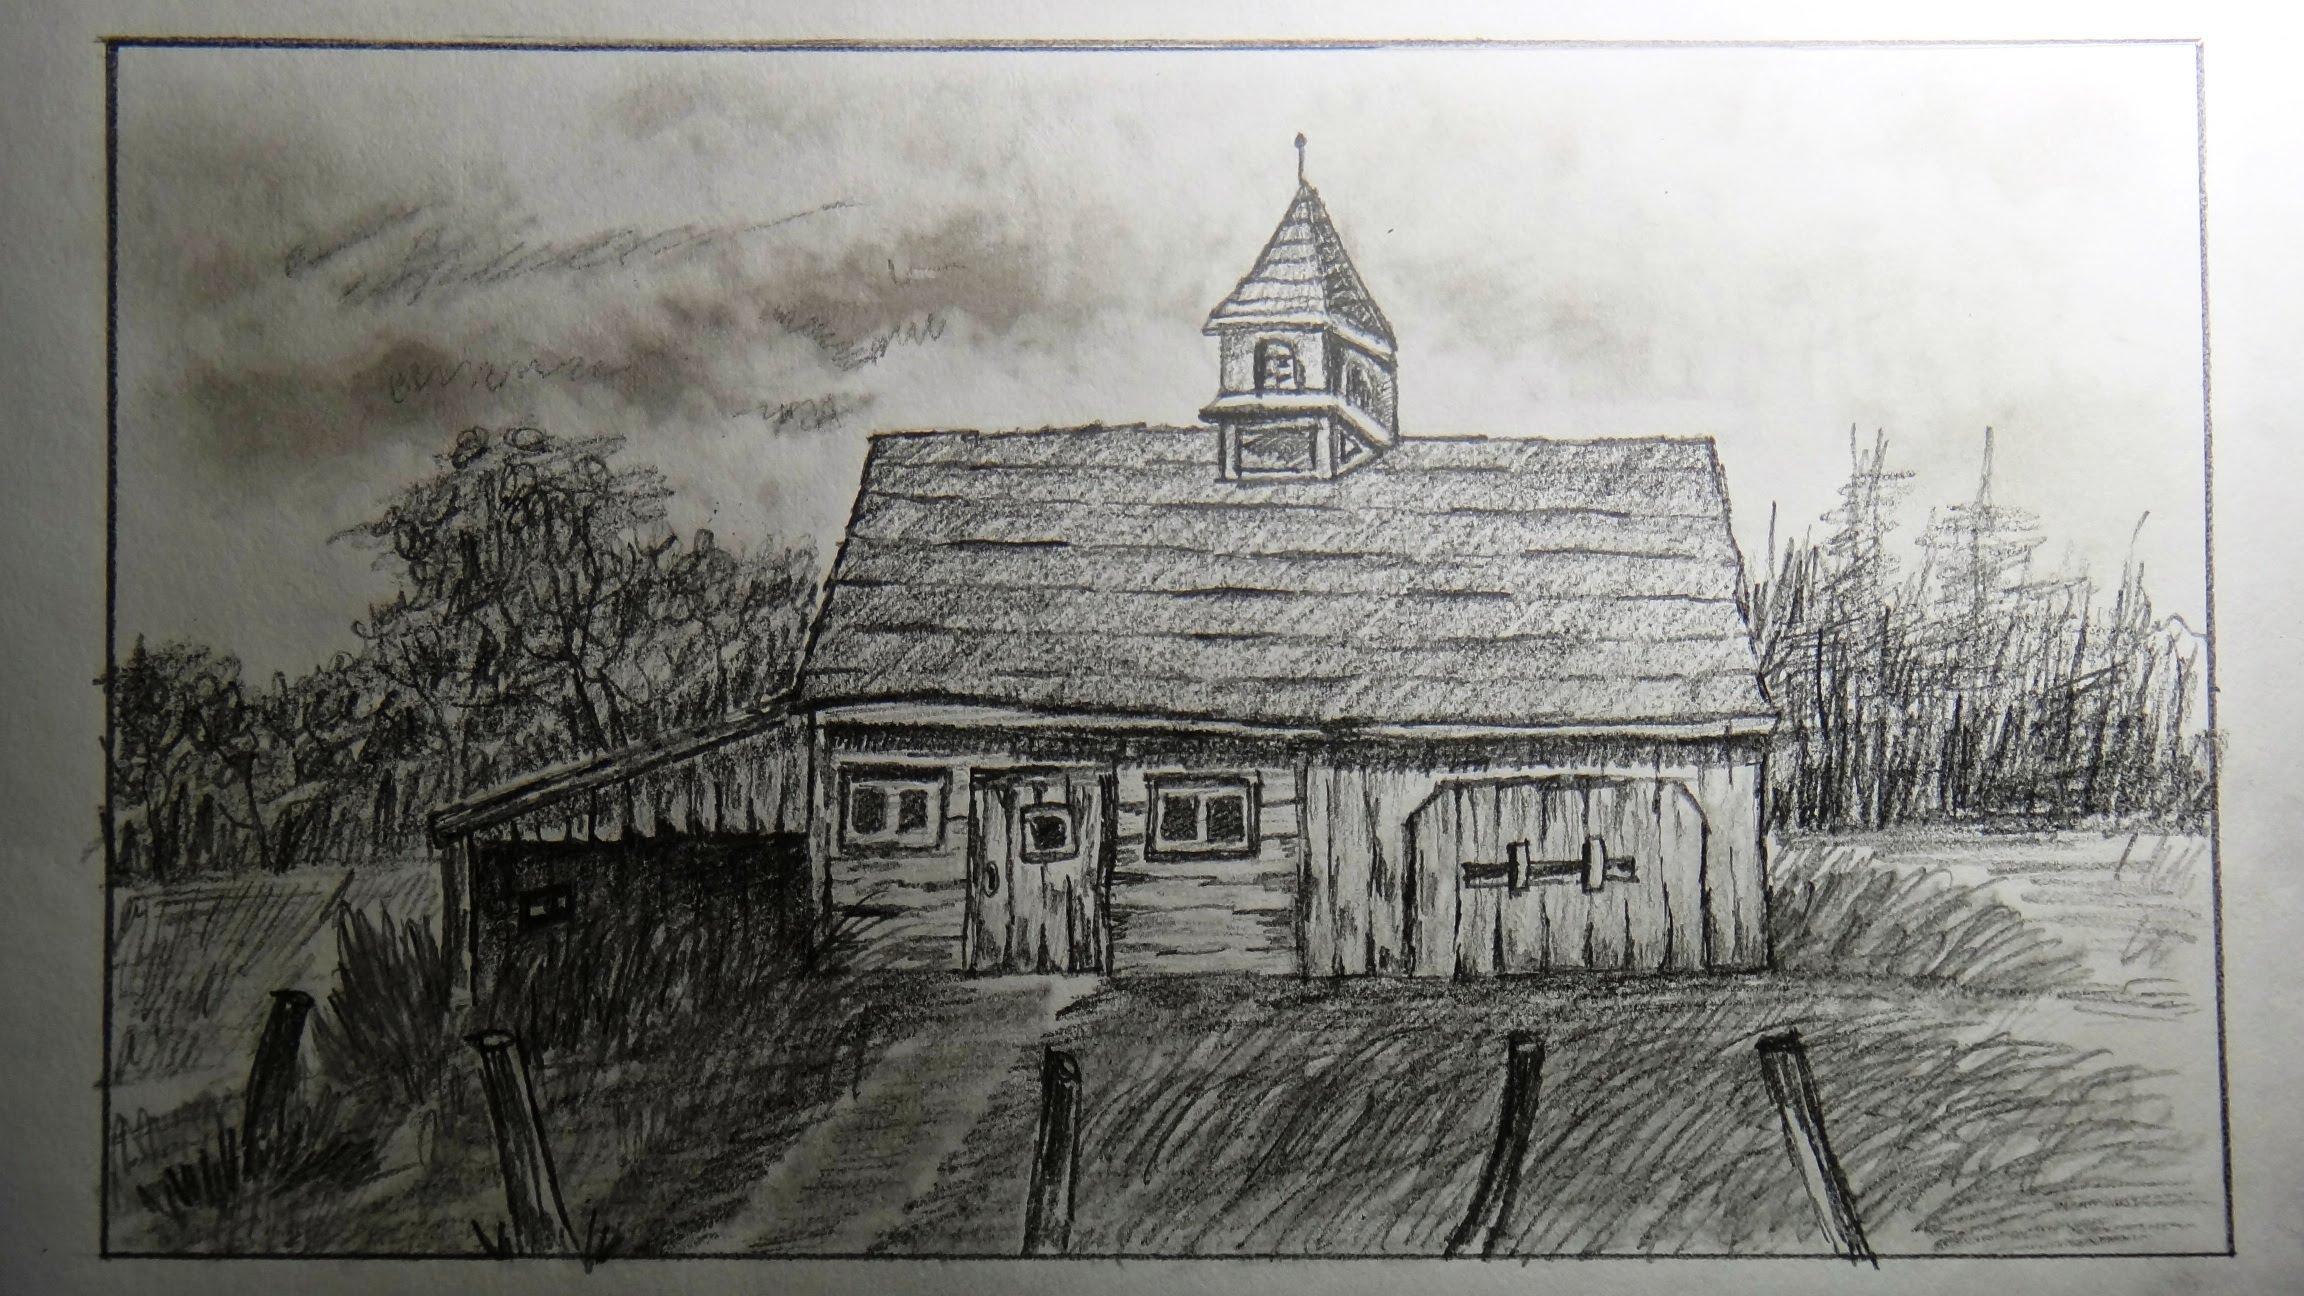 Drawn hosue farm house An YouTube (old farm old